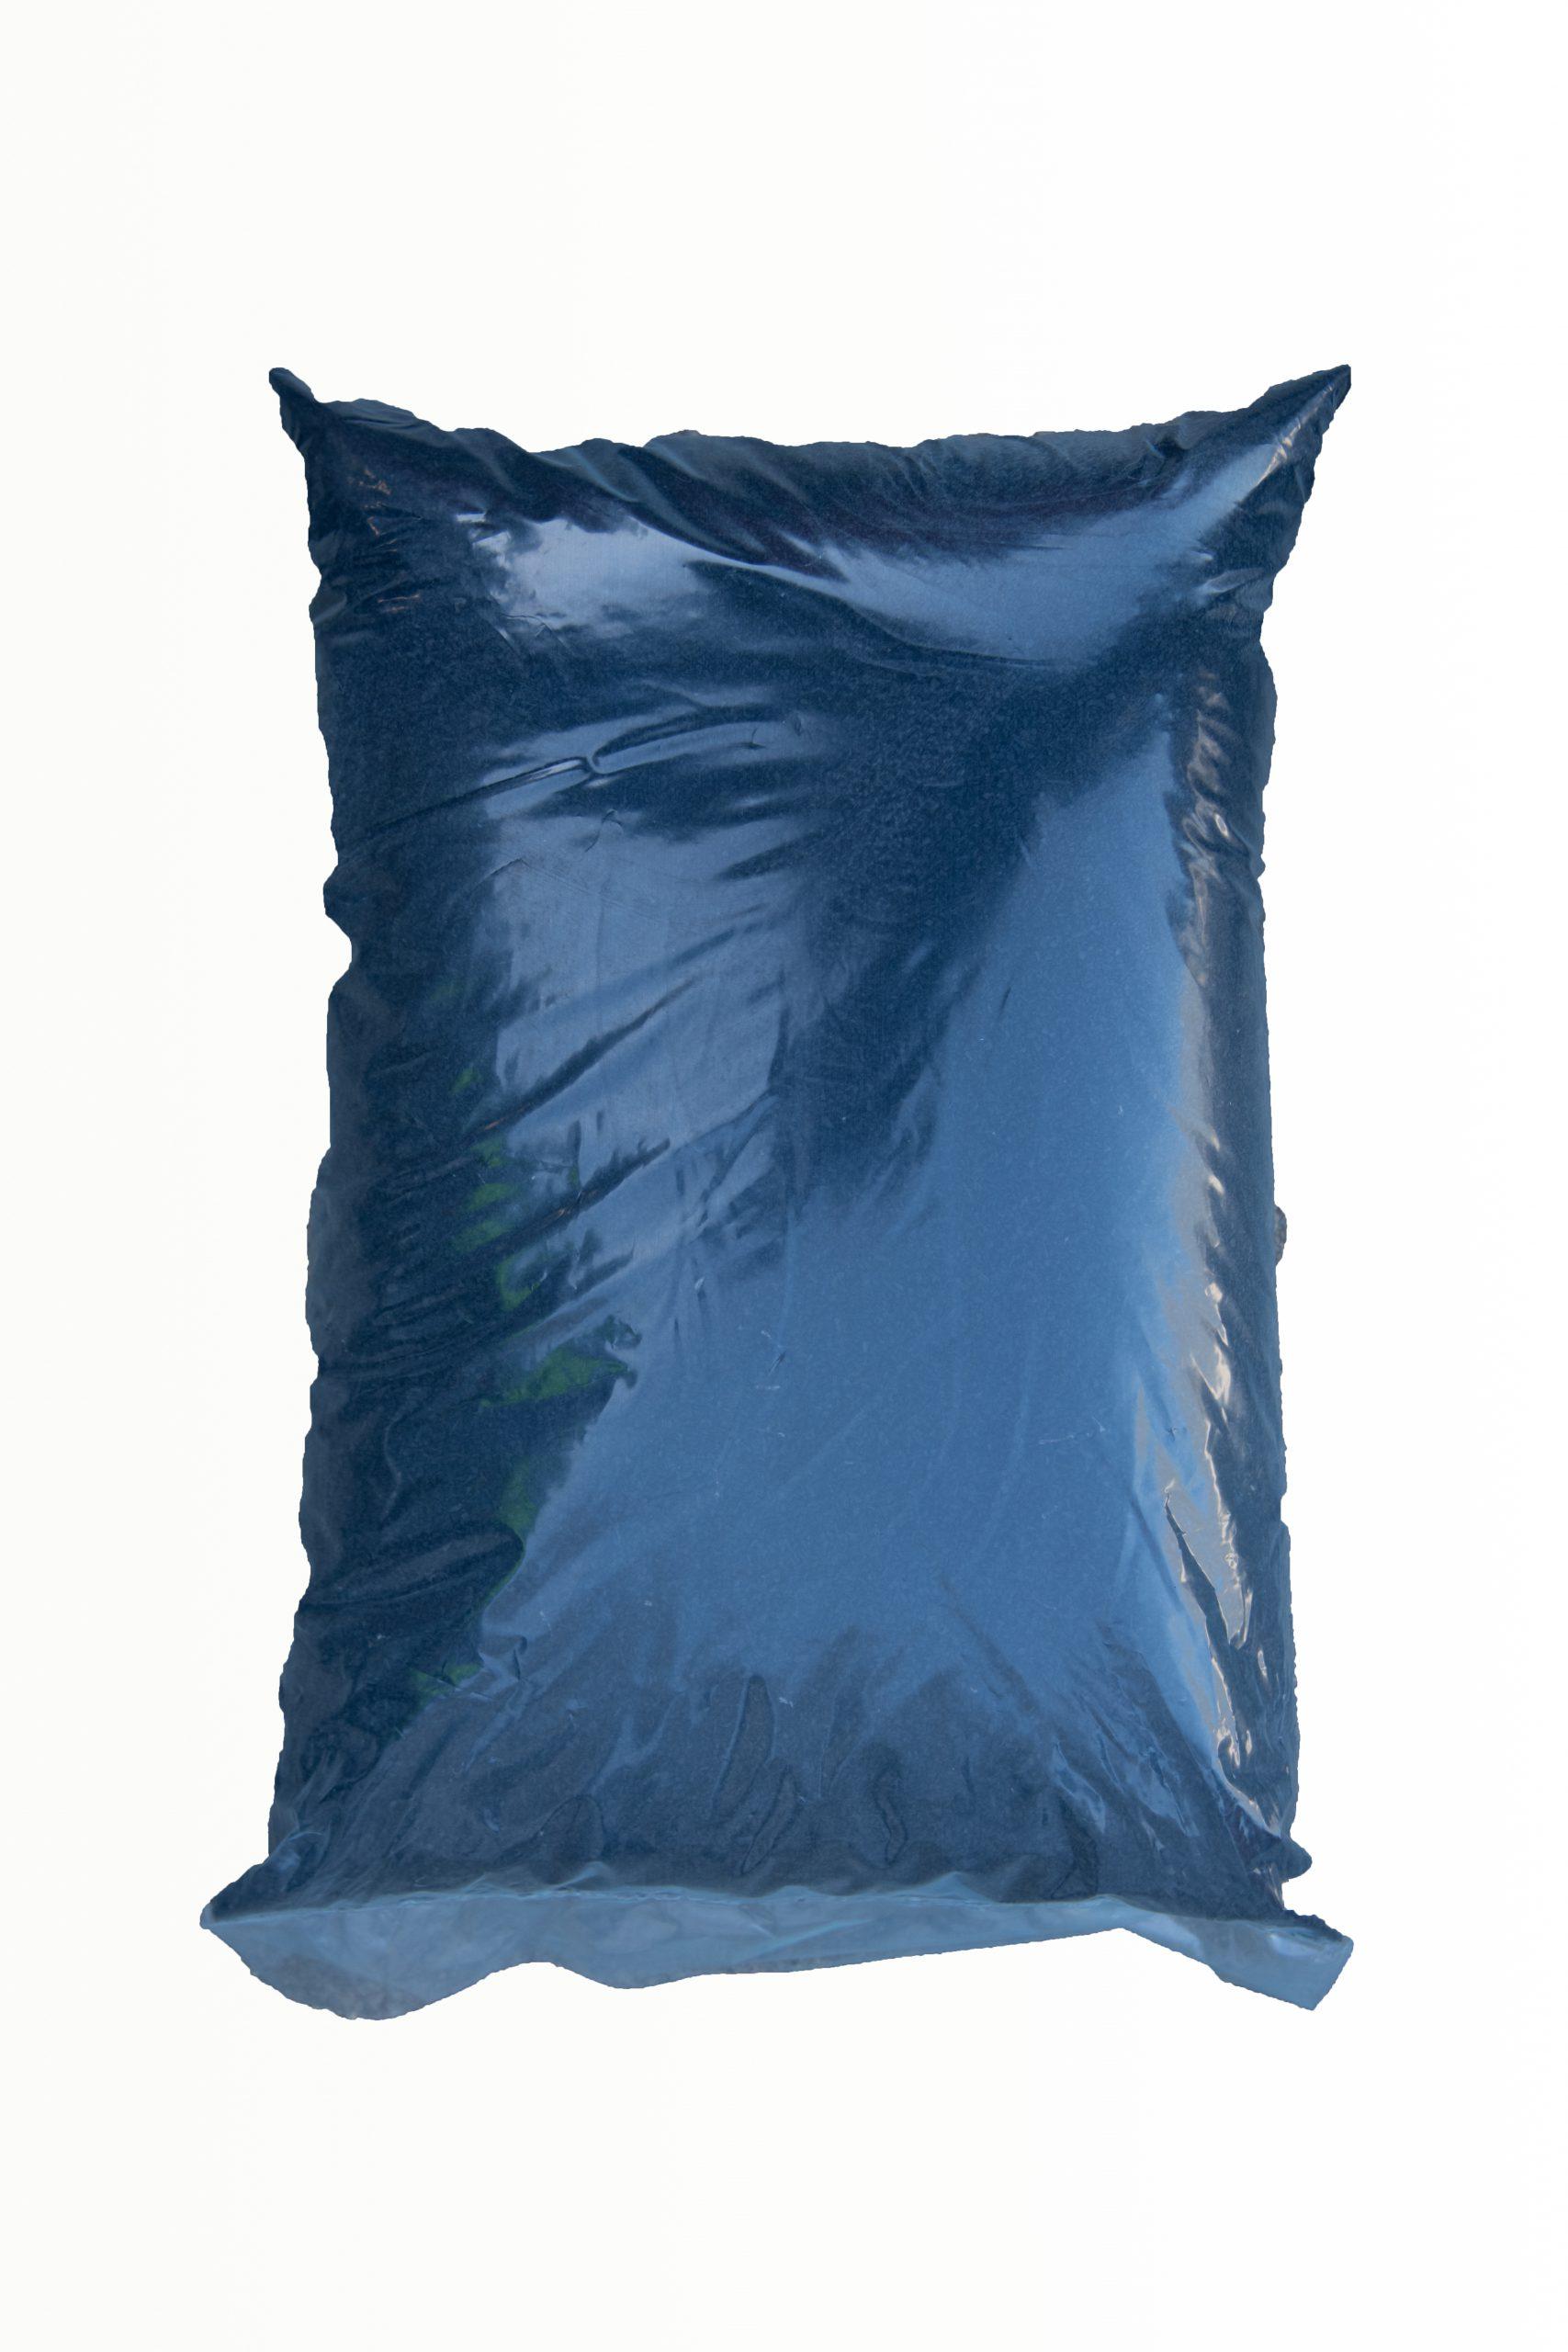 Rubber Granule Bags 20KG